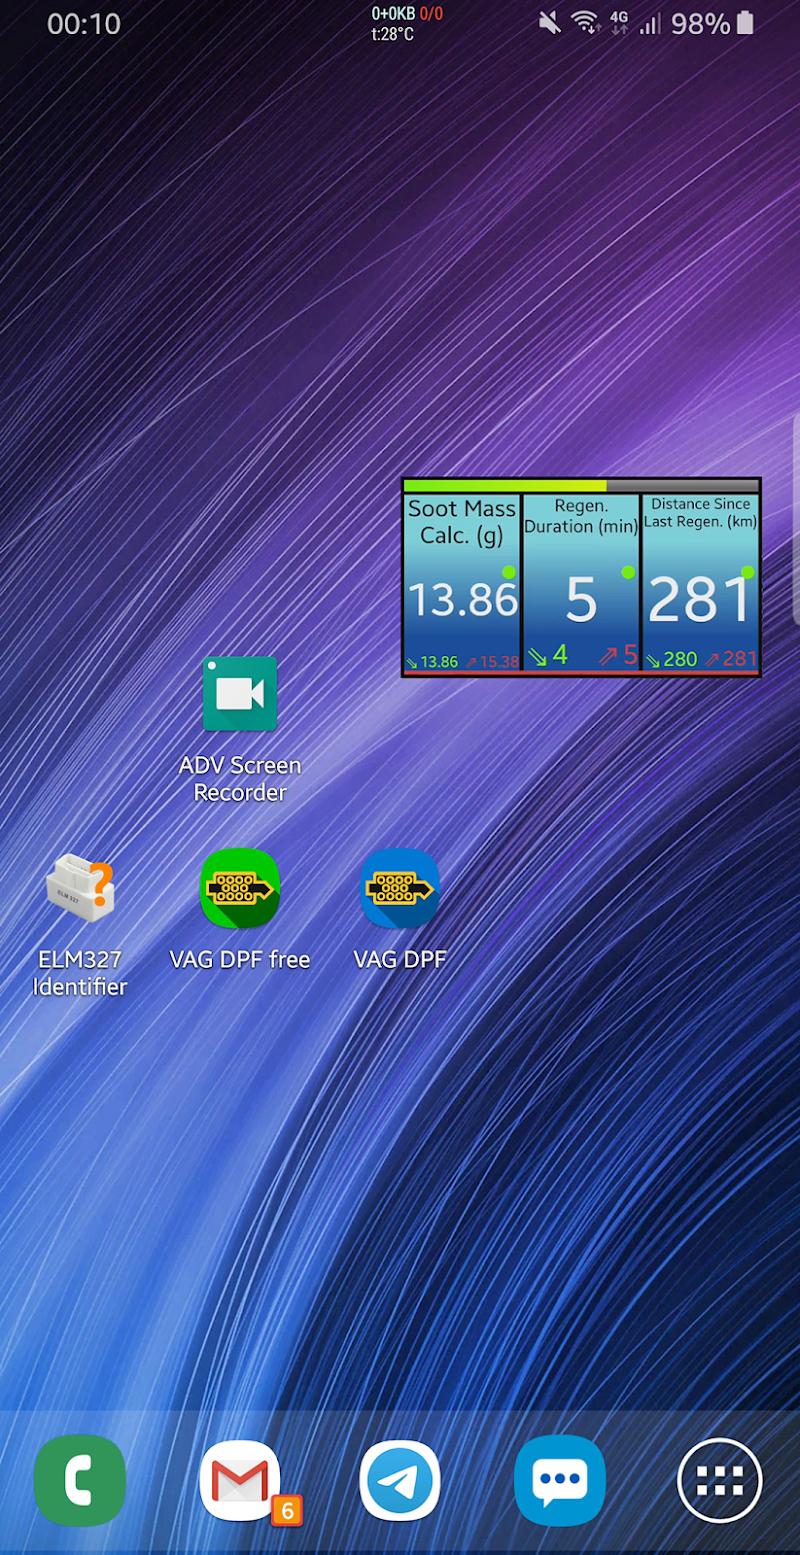 VAG DPF Screenshot 2